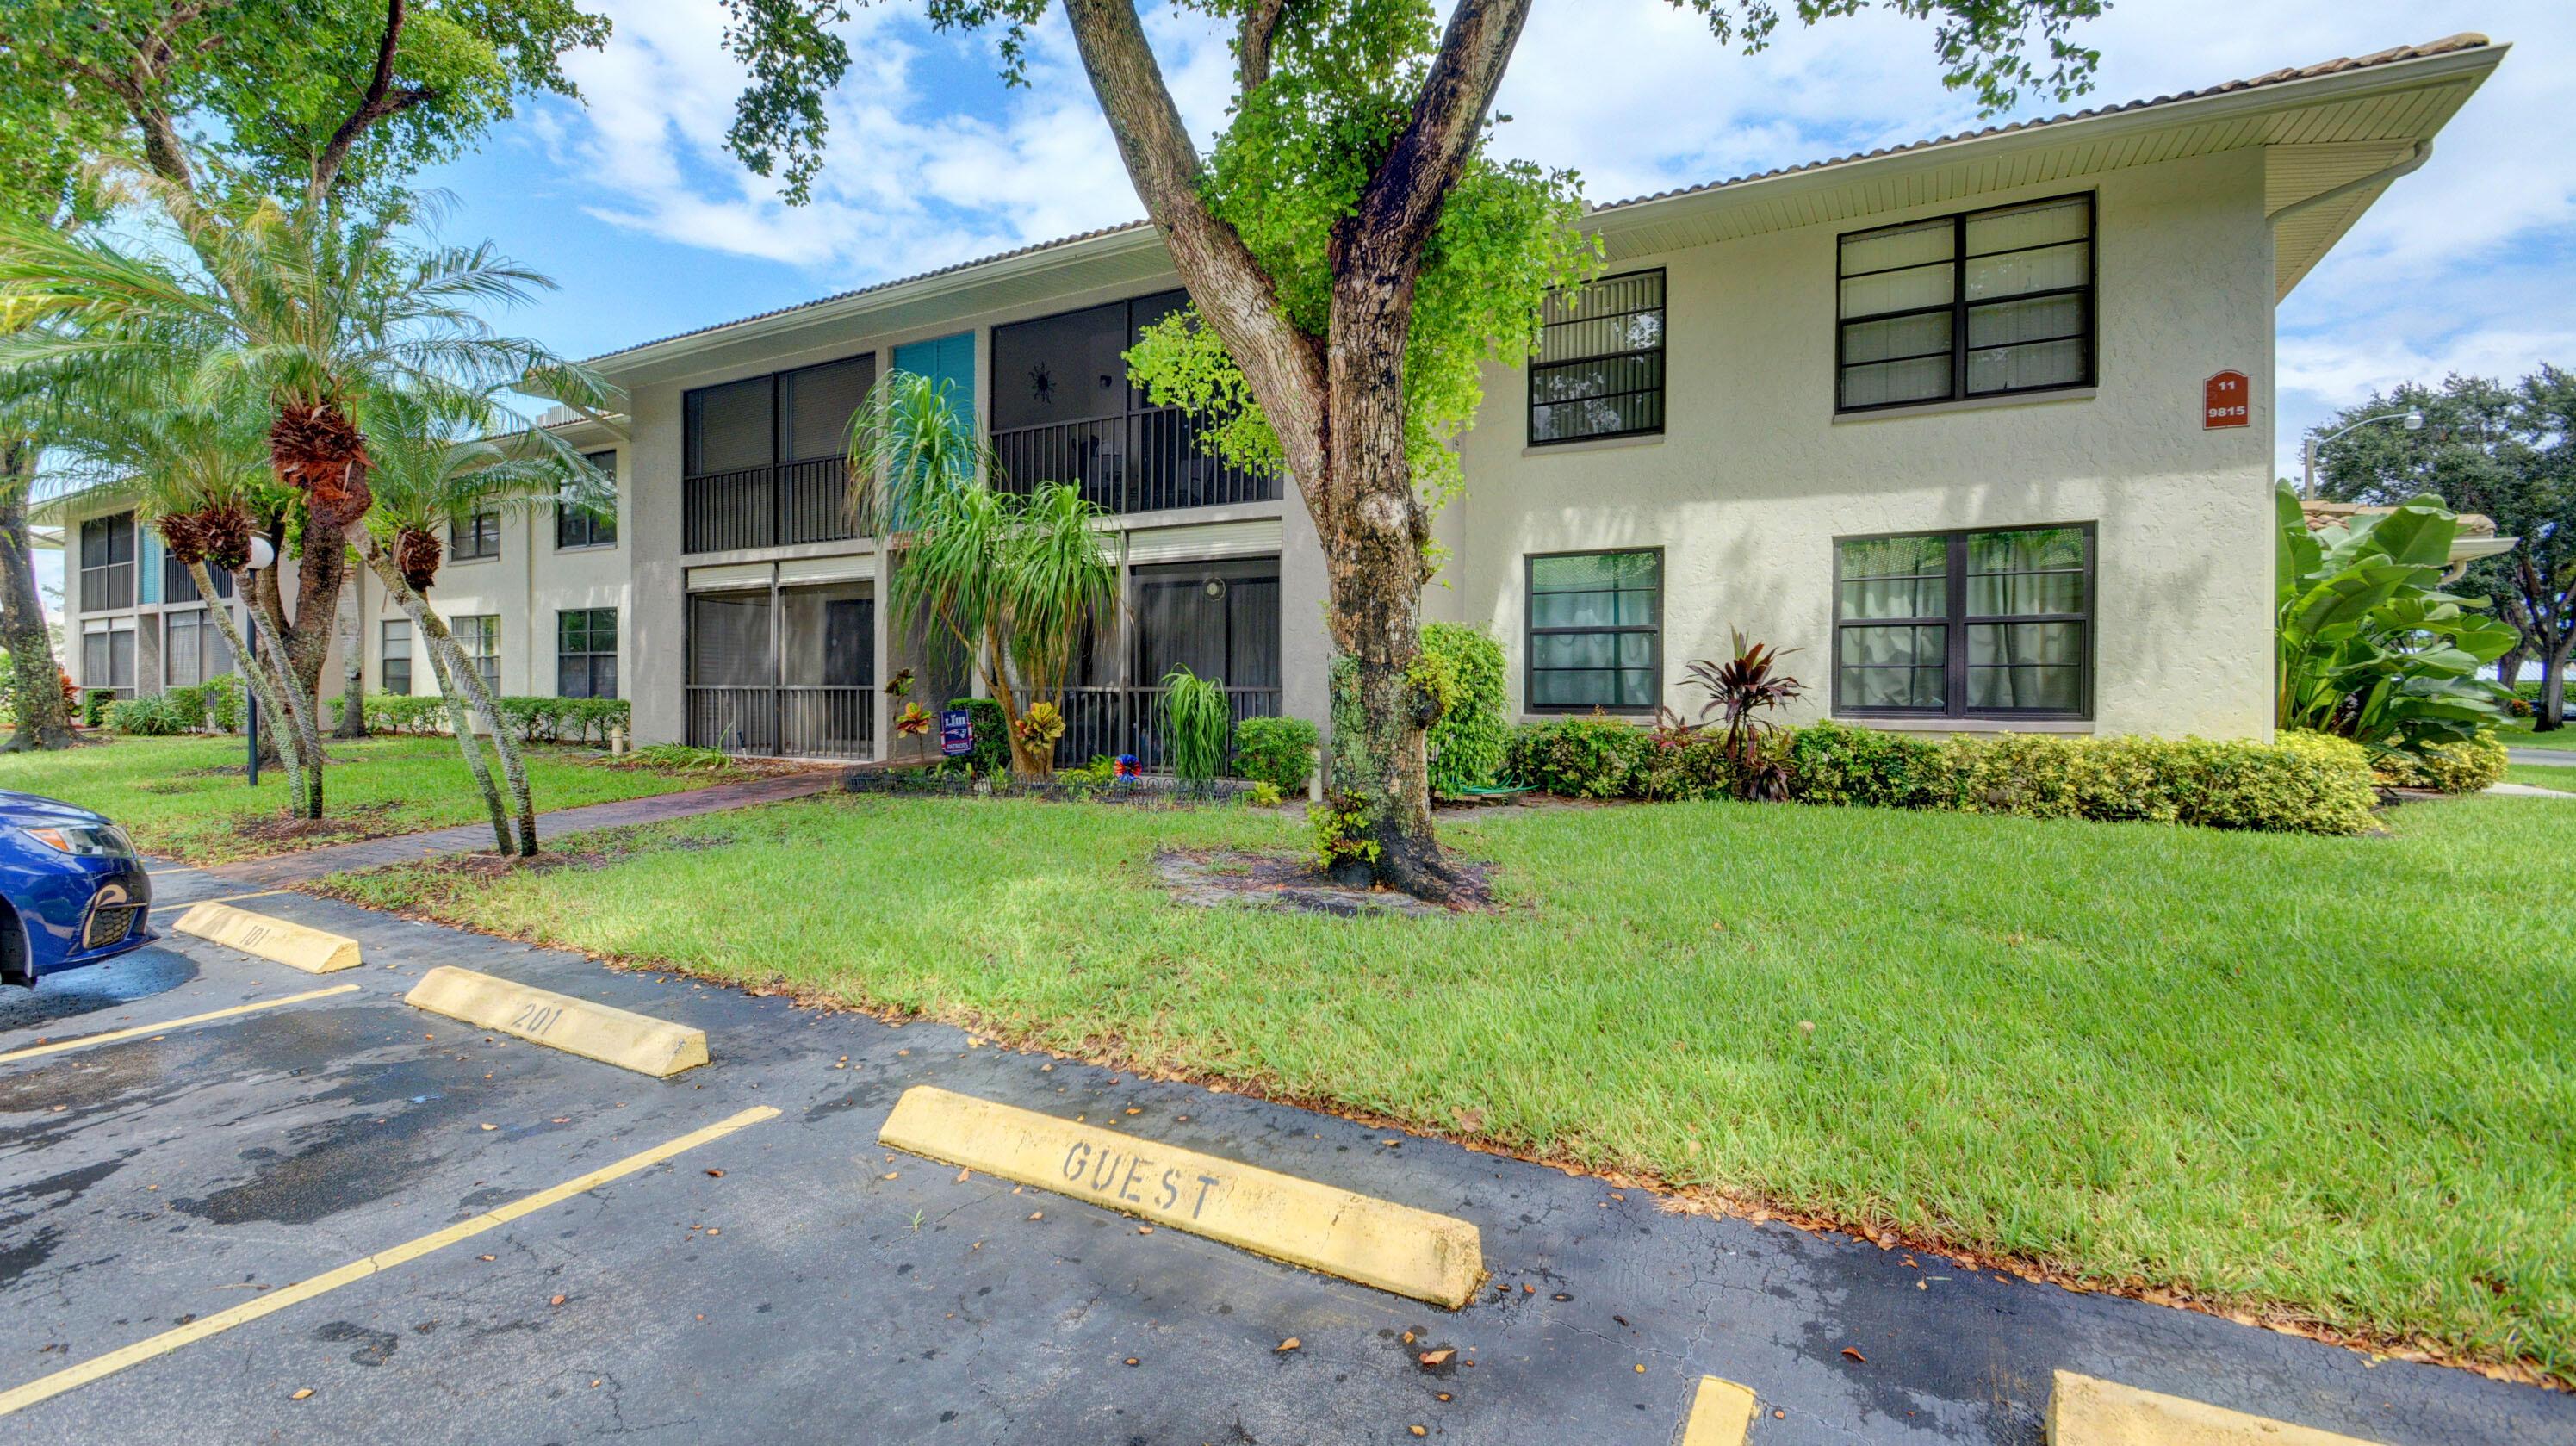 9815 Pineapple Tree Dr 103 Boynton Beach, FL 33436